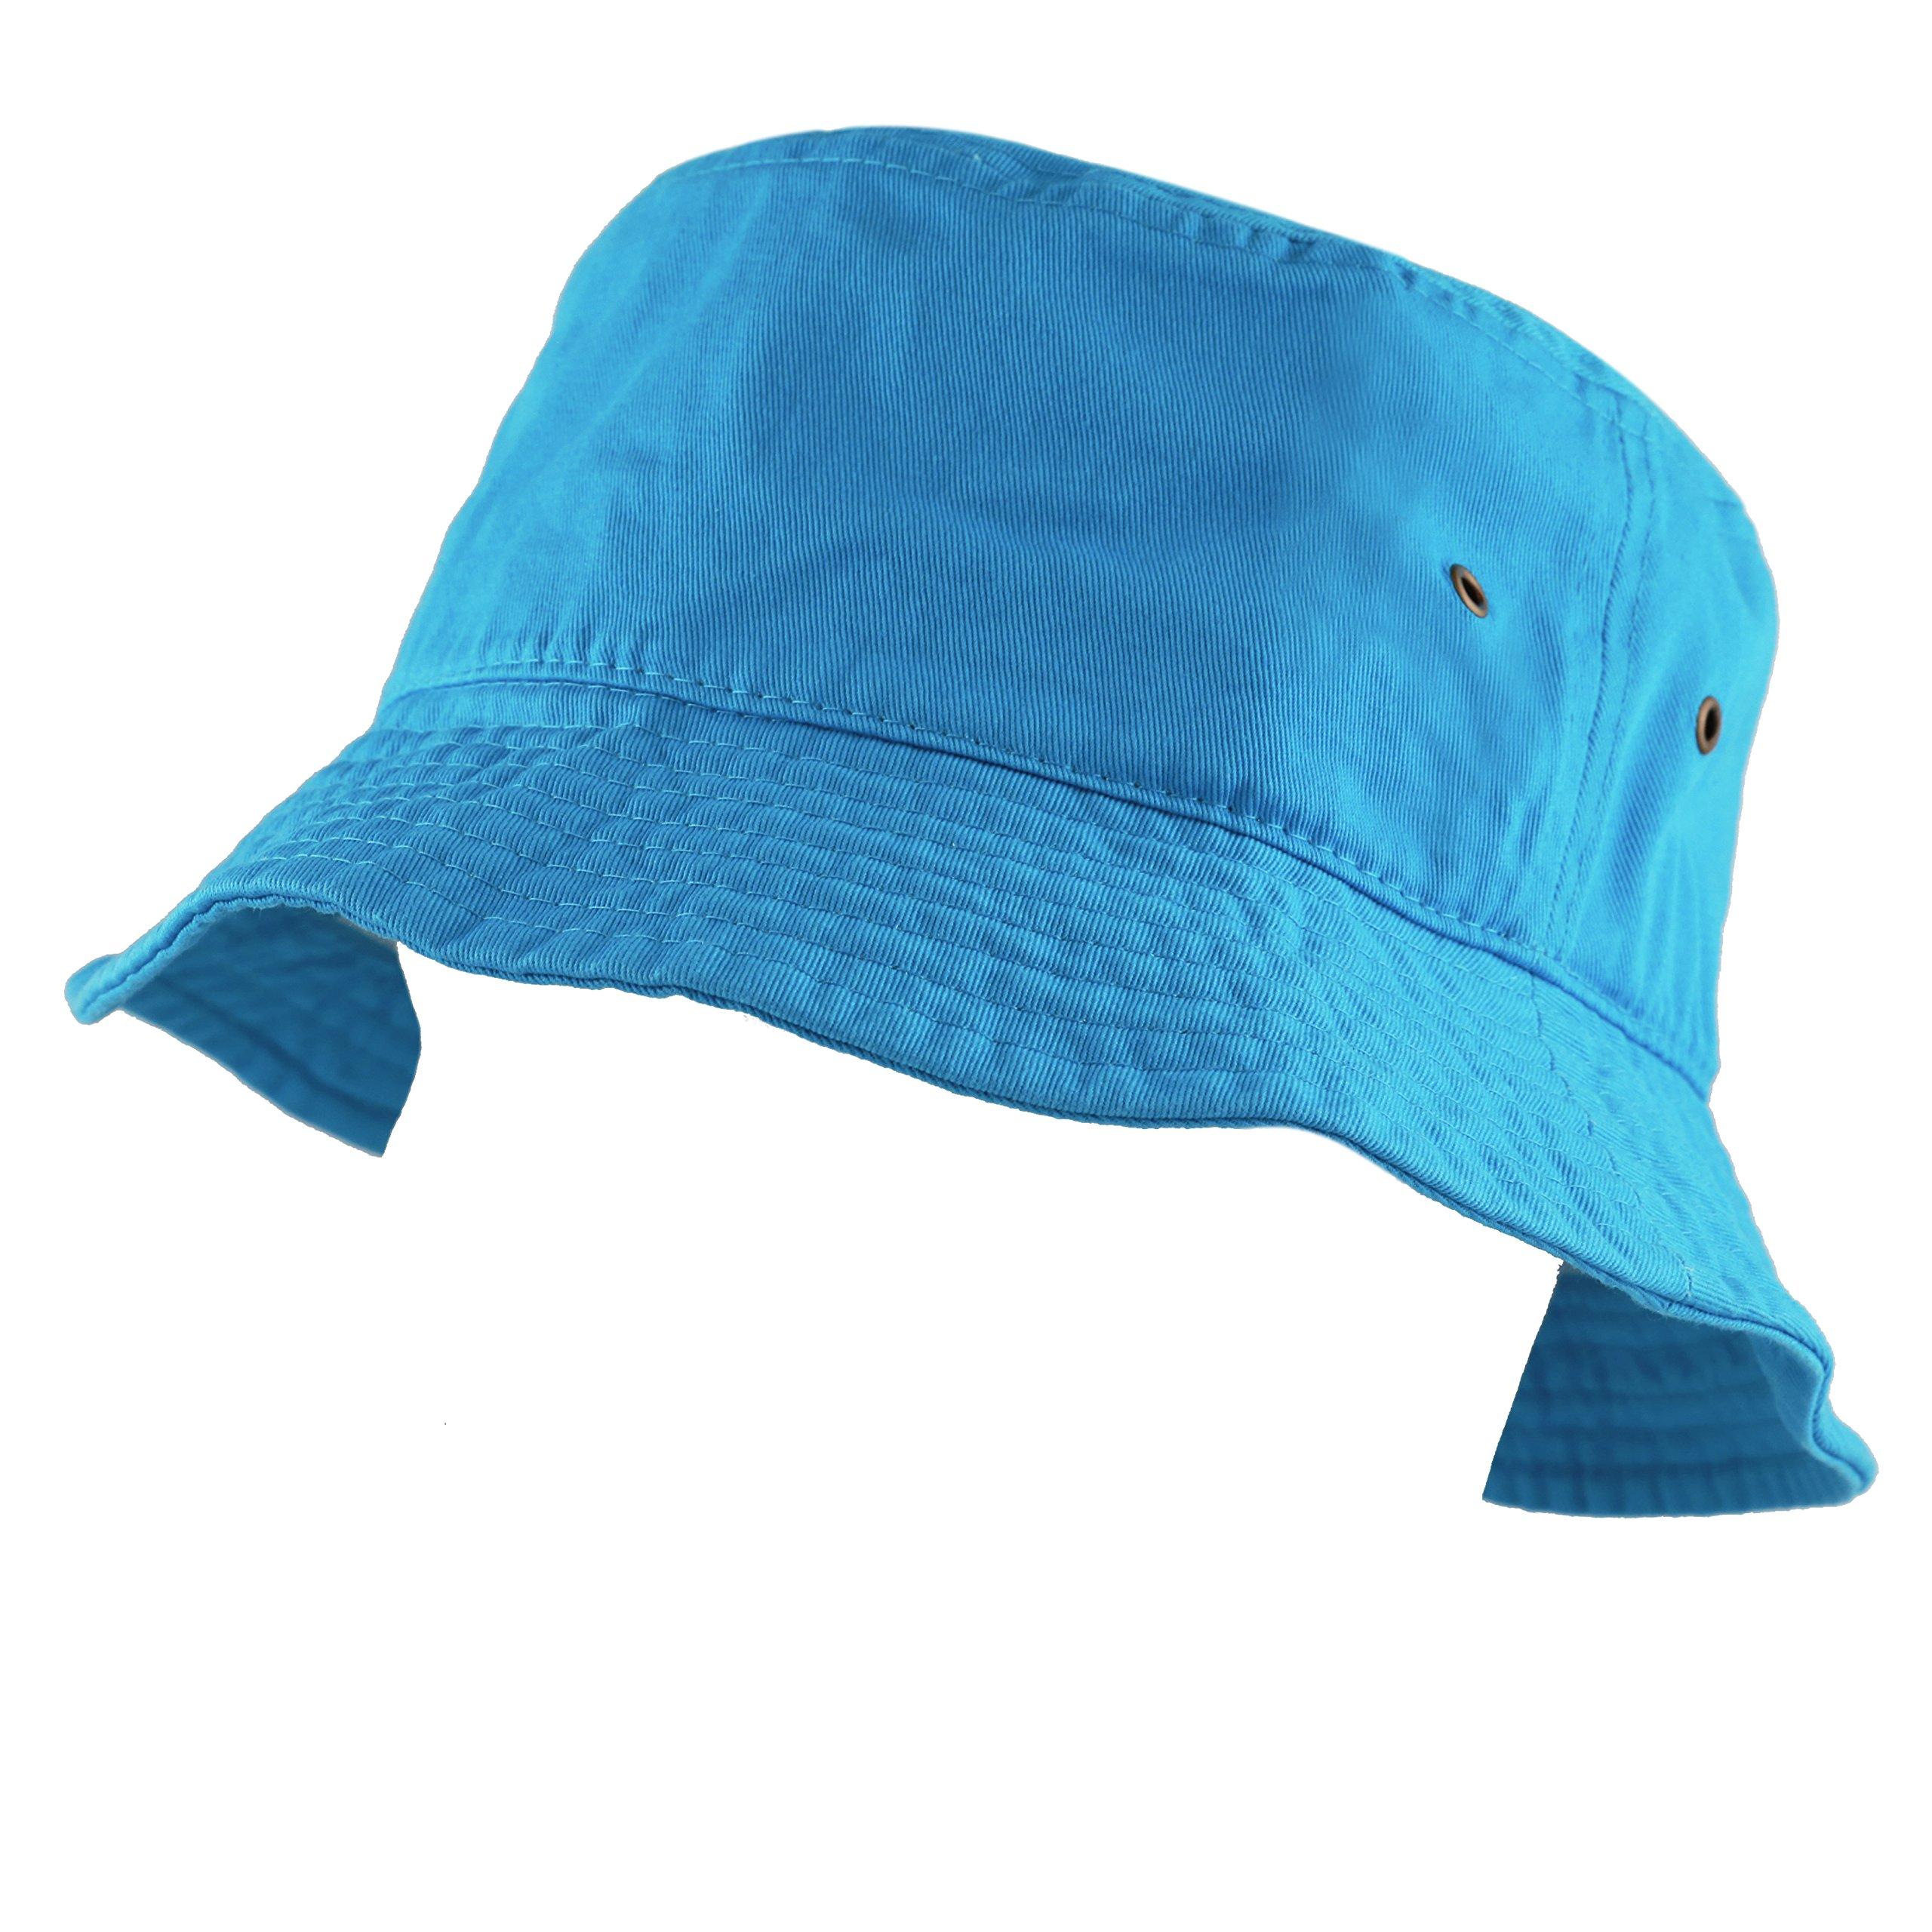 1d70bff5e24 Details about THE HAT DEPOT 300N Unisex 100% Cotton Packable Summer Travel  Bucket Hat (S M